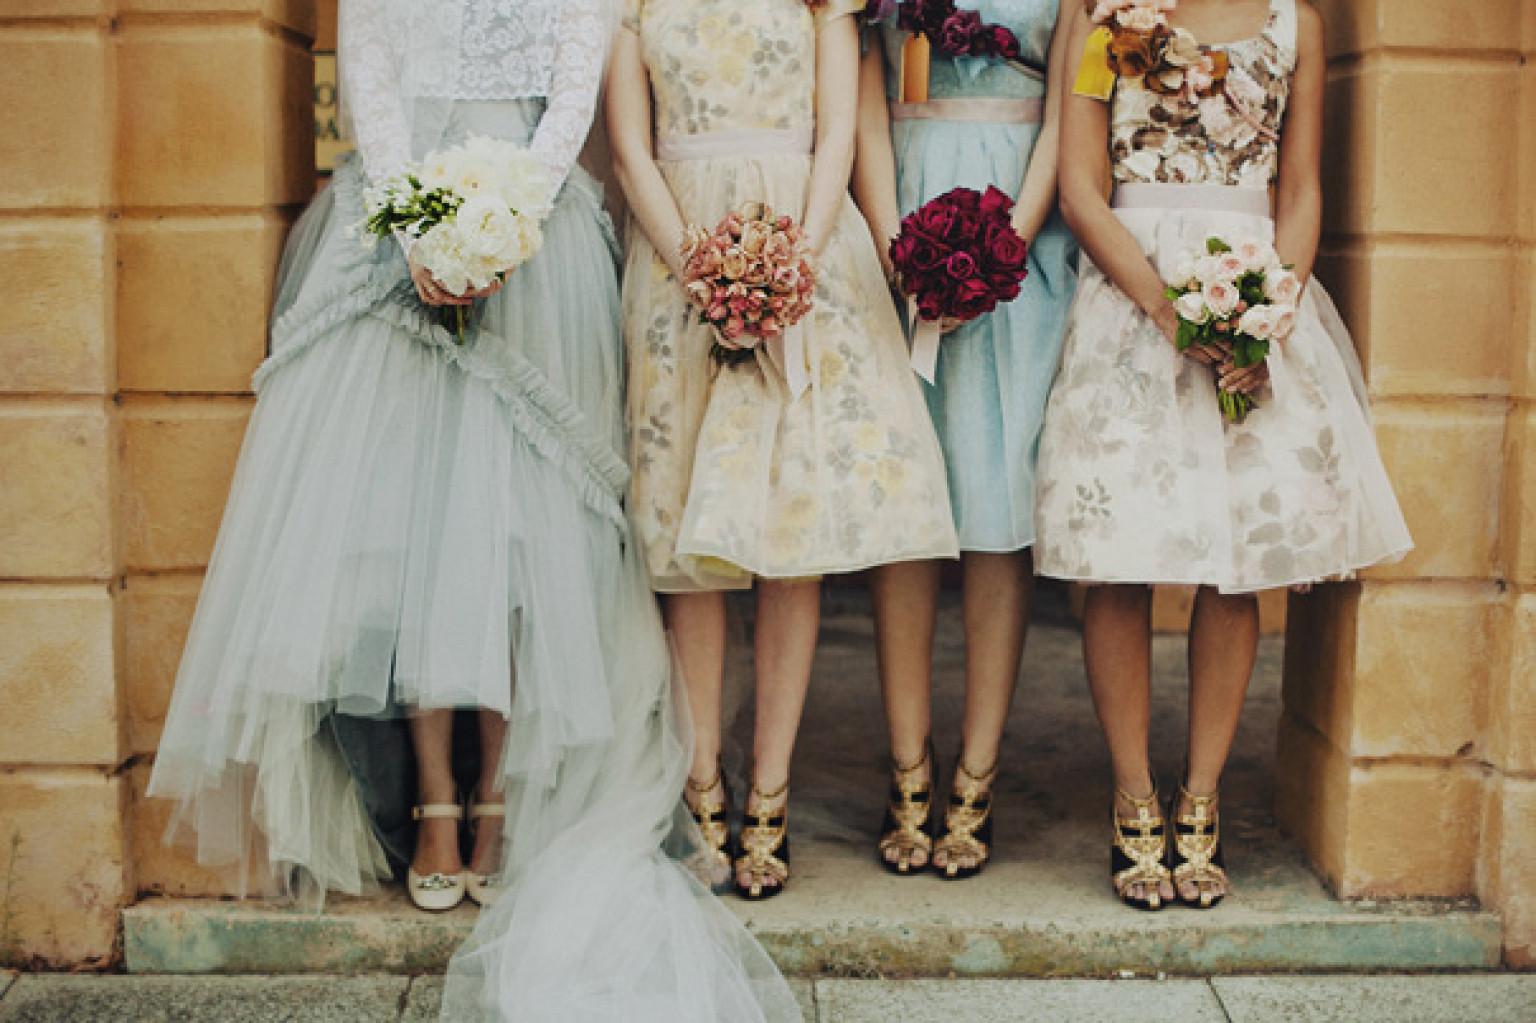 o-VINTAGE-BRIDESMAID-DRESSES-facebook+(1).jpg